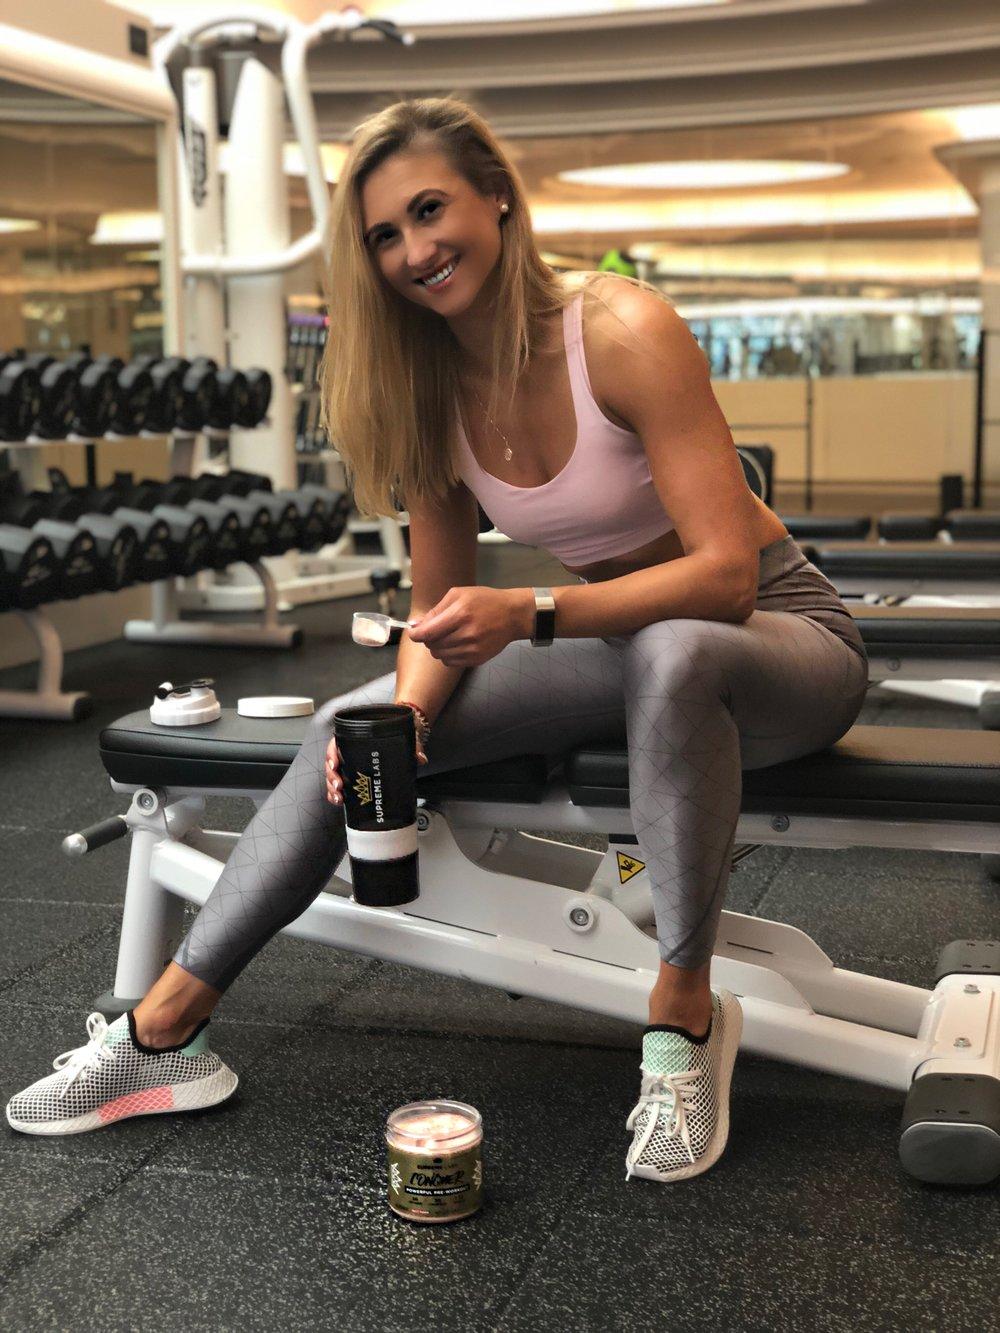 preworkout drink irena putans equinox personal trainer